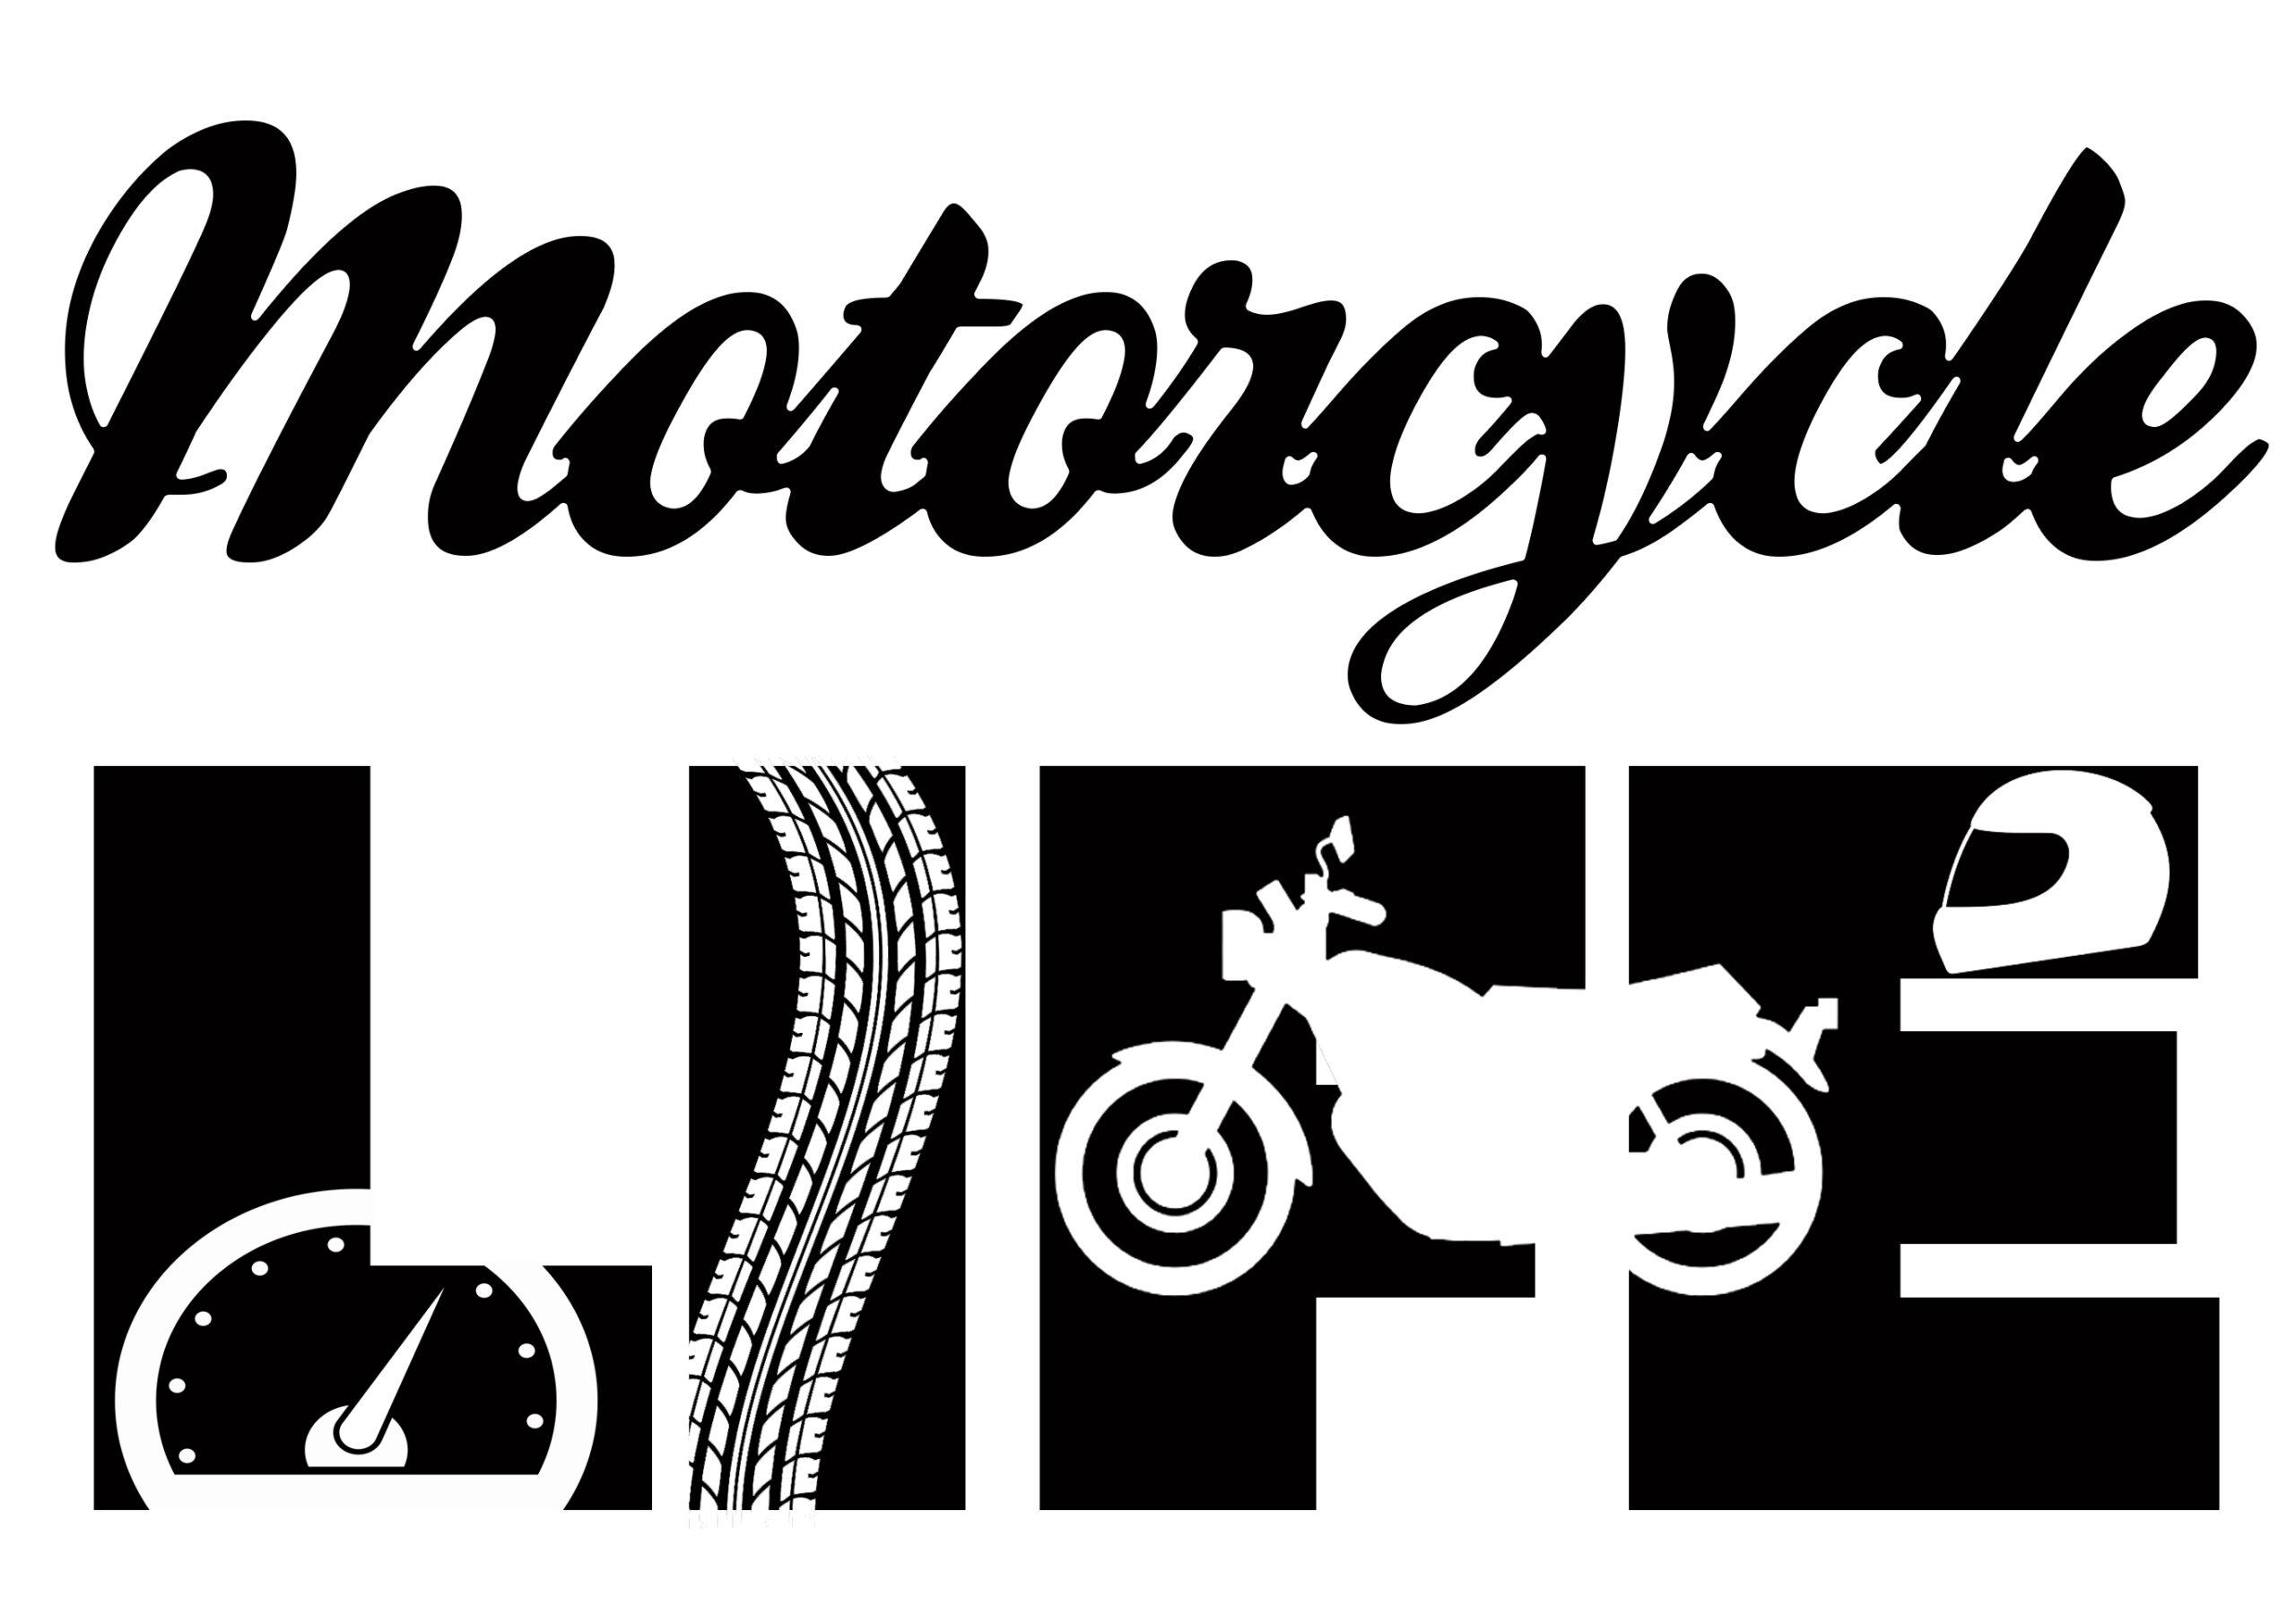 Free Motorcycle Life SVG File